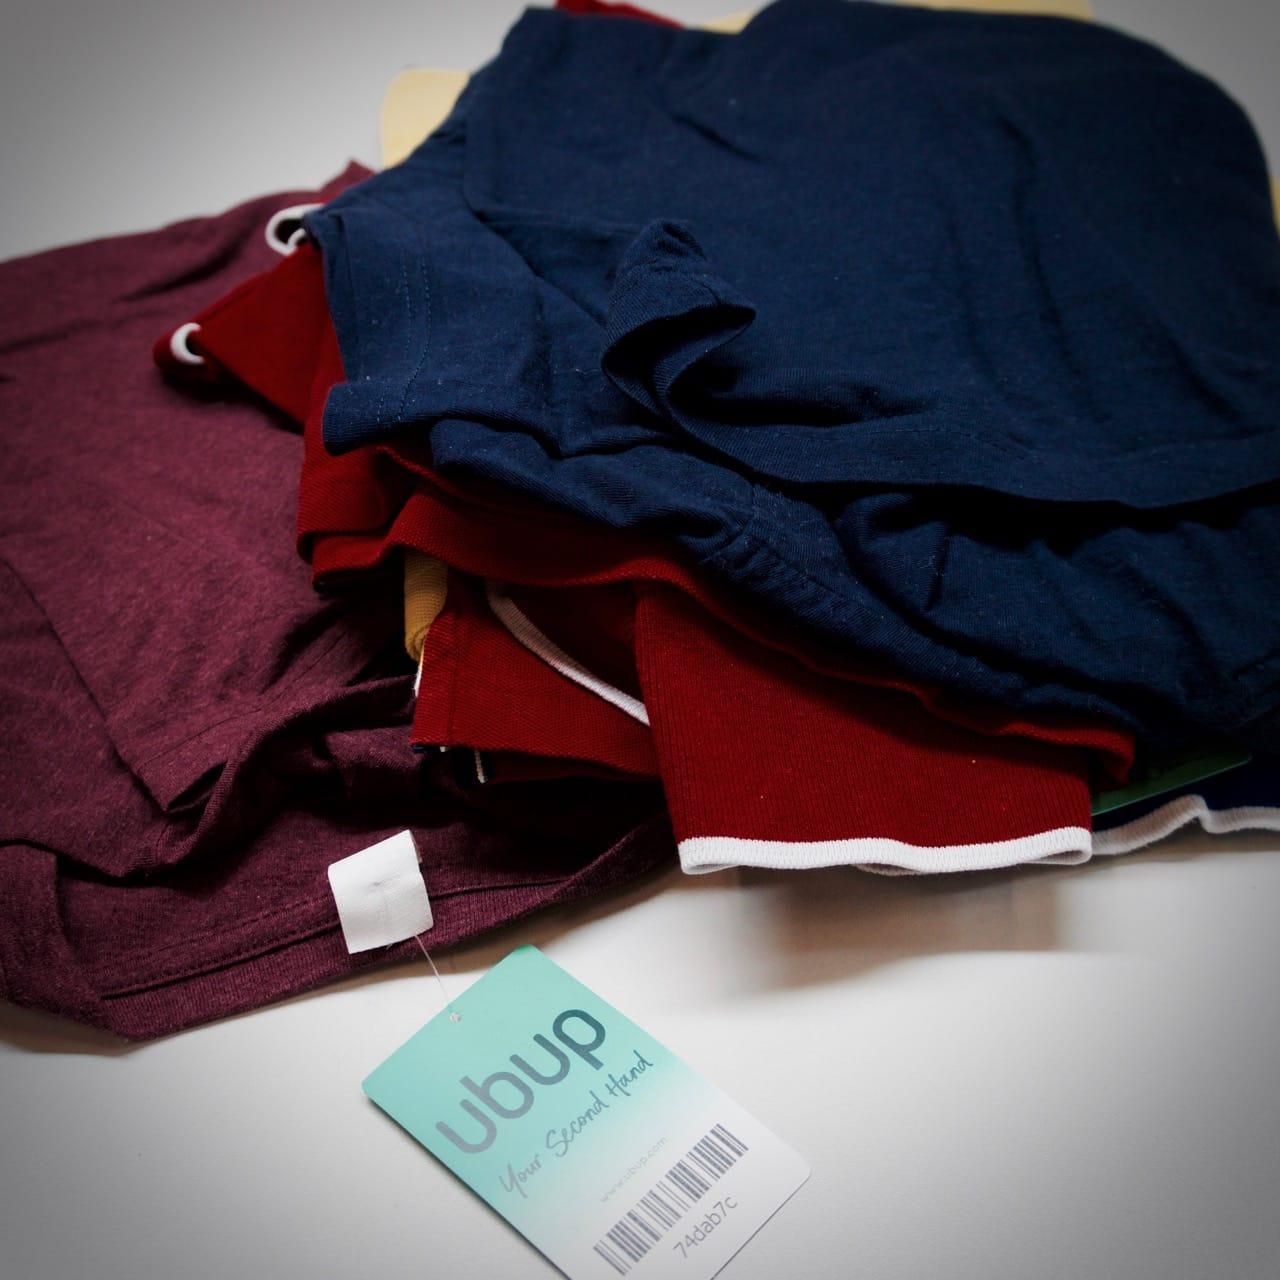 DASISTmomox fashion - Folge mir durch unser Lager 4